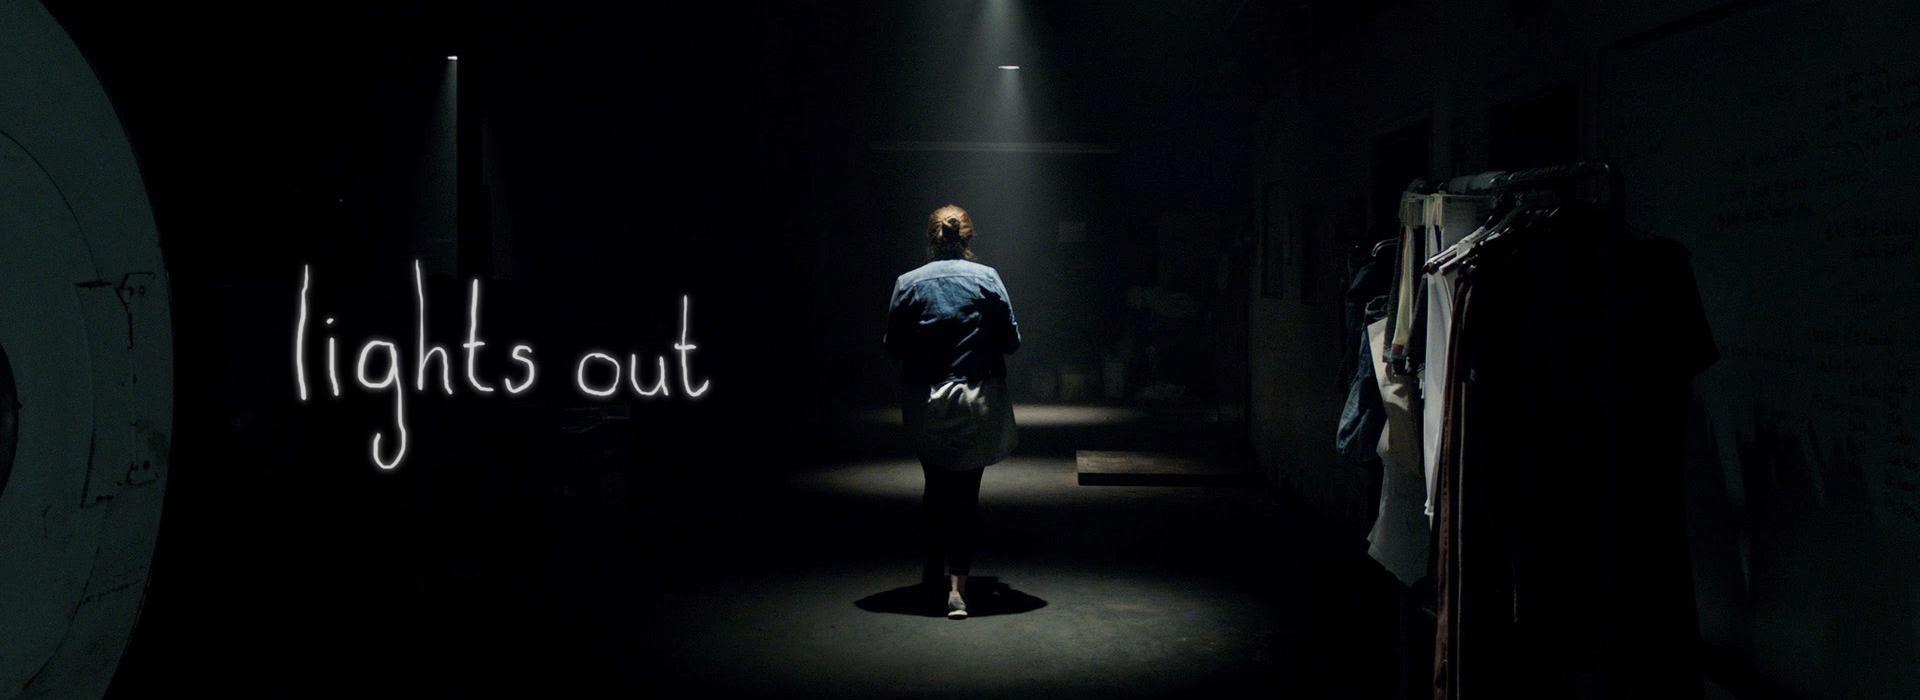 isiklar-sonunda-korku-filmi